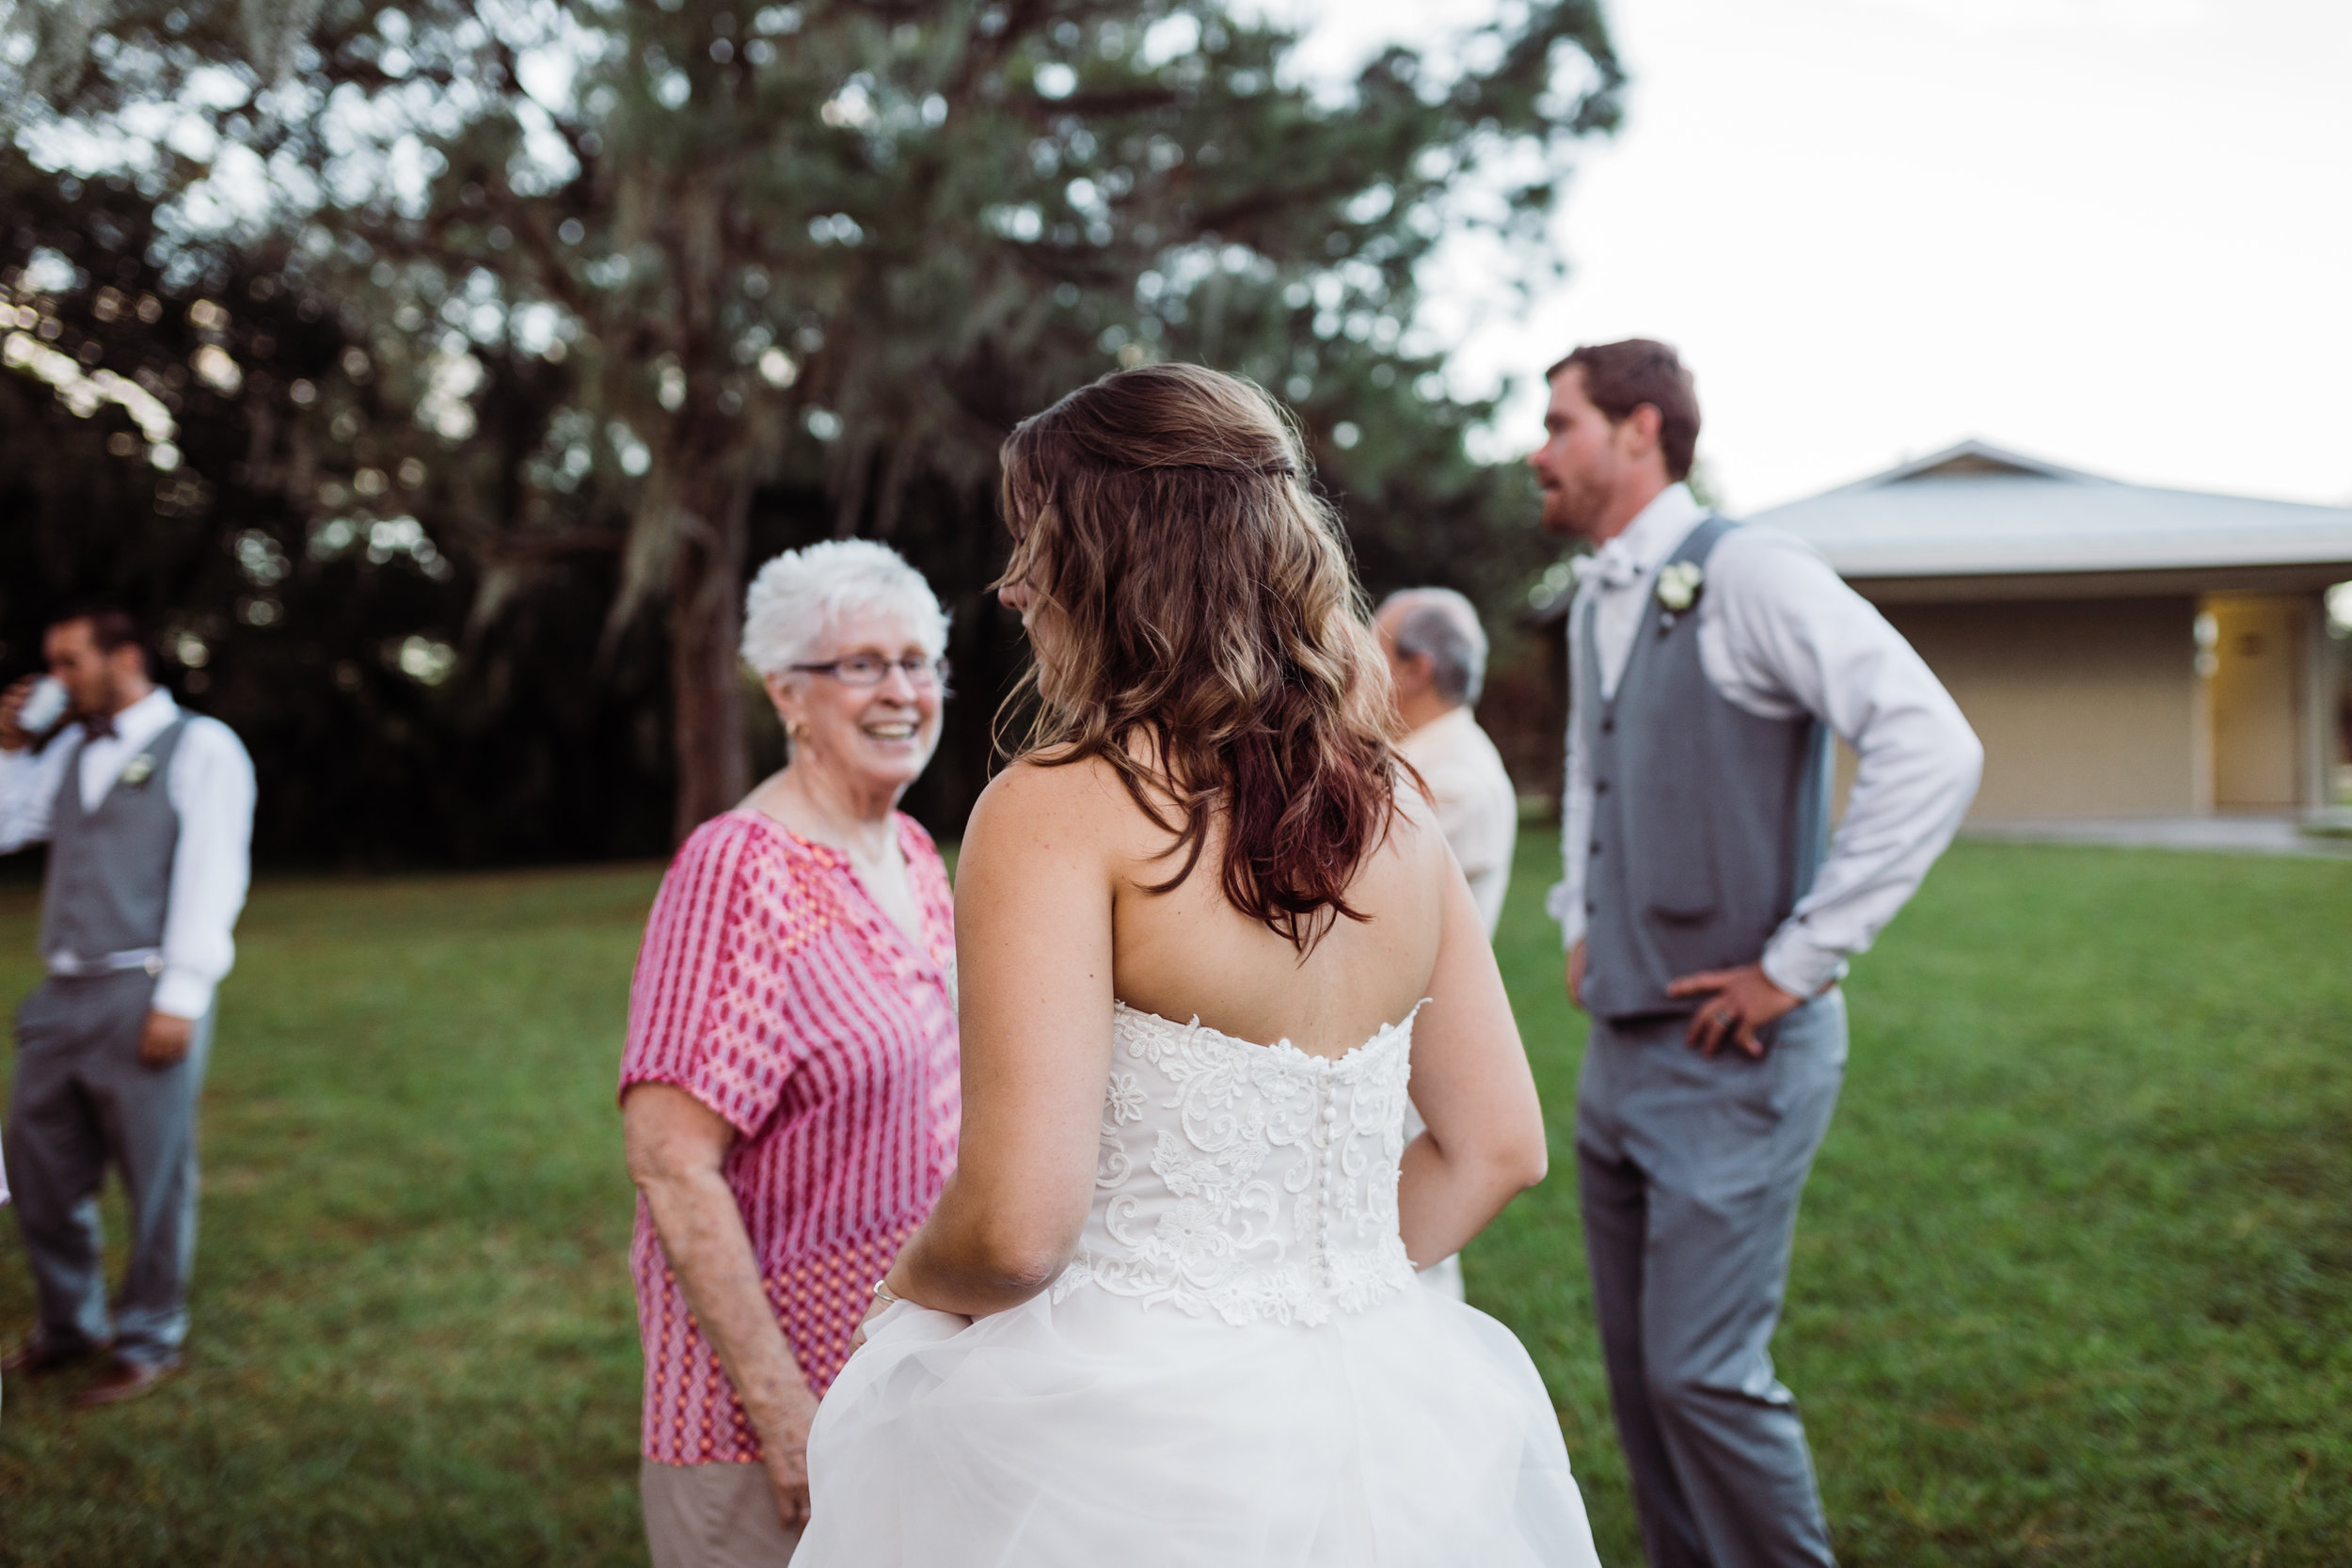 2017.10.14 Samantha and Matthew Crabtree Sarasota Wedding (518 of 708).jpg